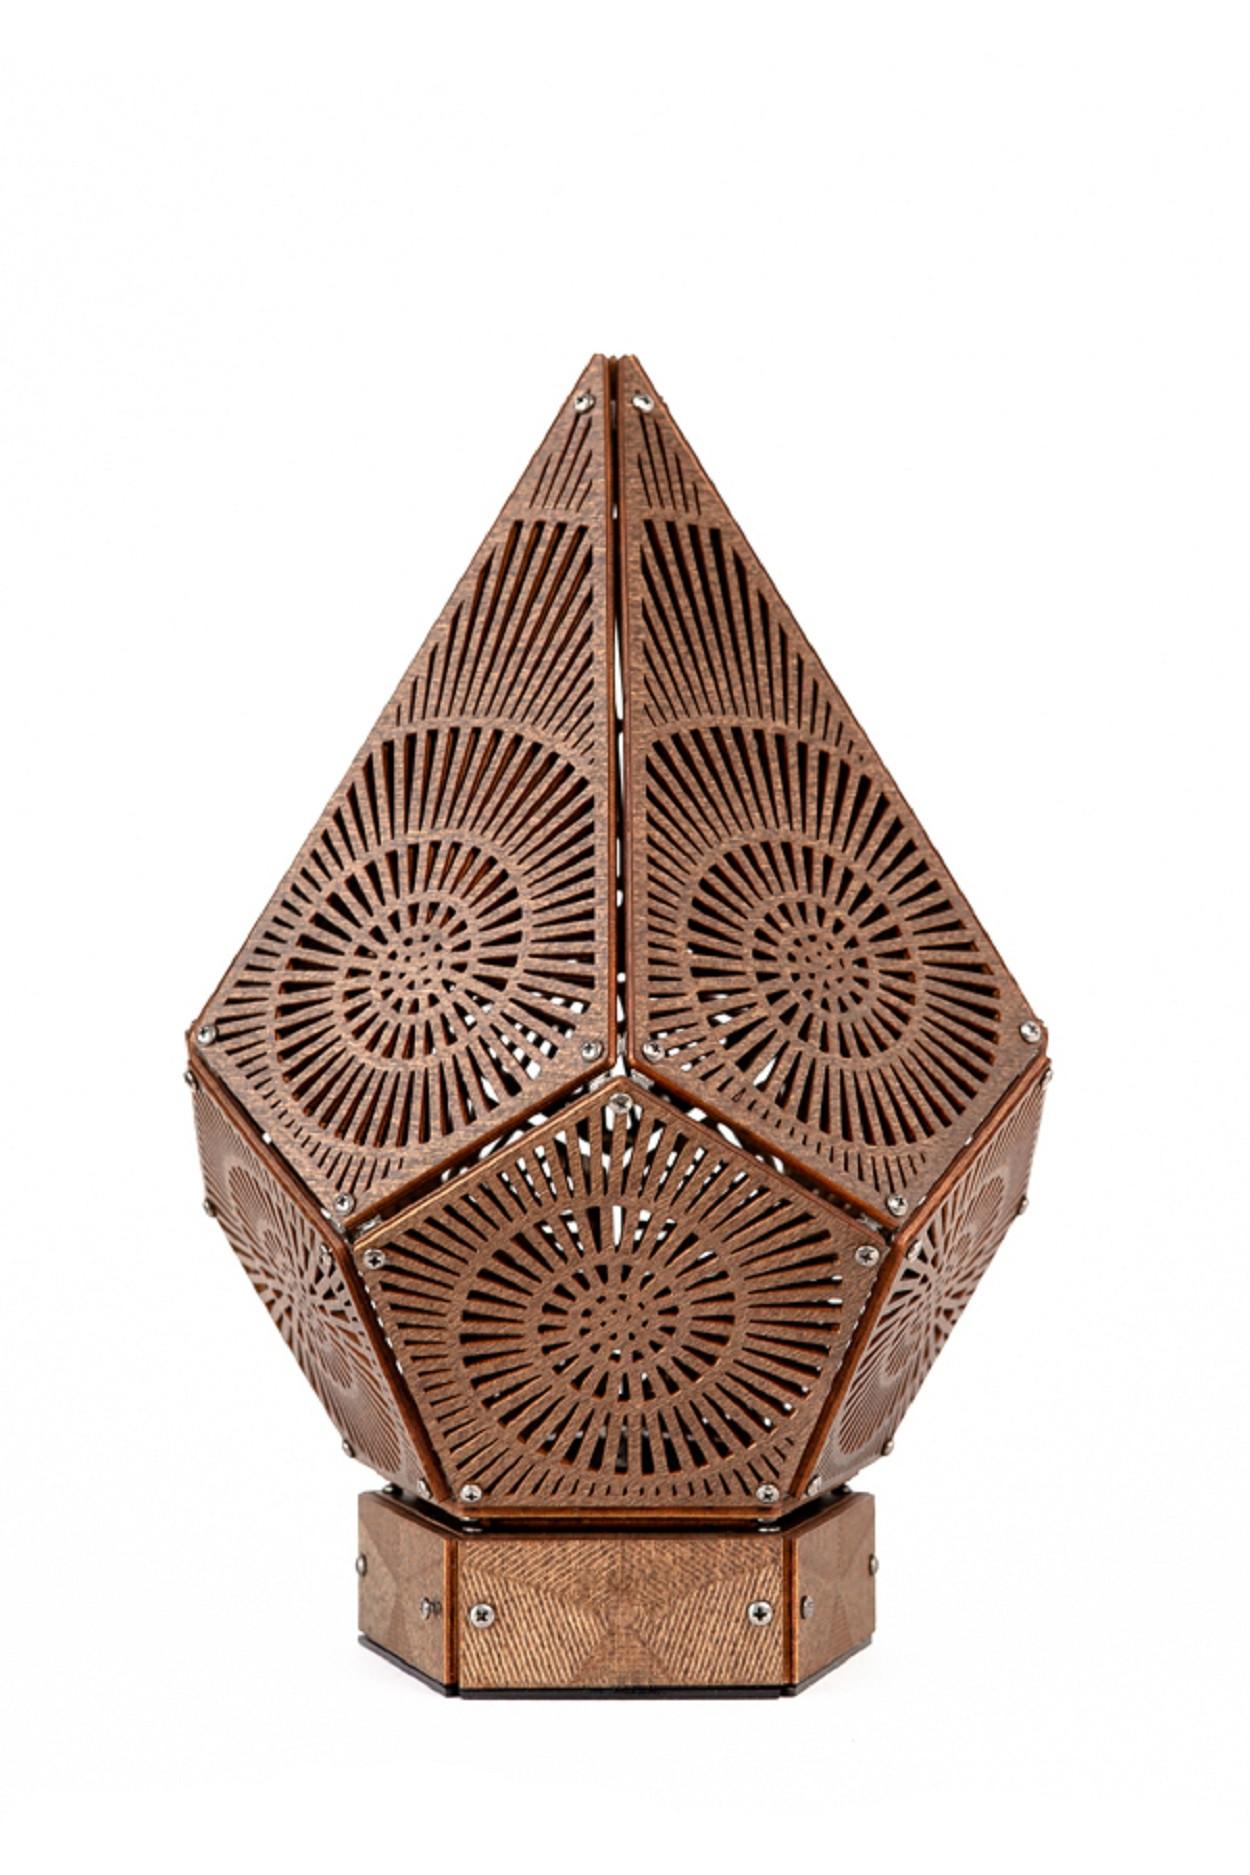 Ночник  Simple, рисунок Nautilus, коричневый, (145х220 мм)